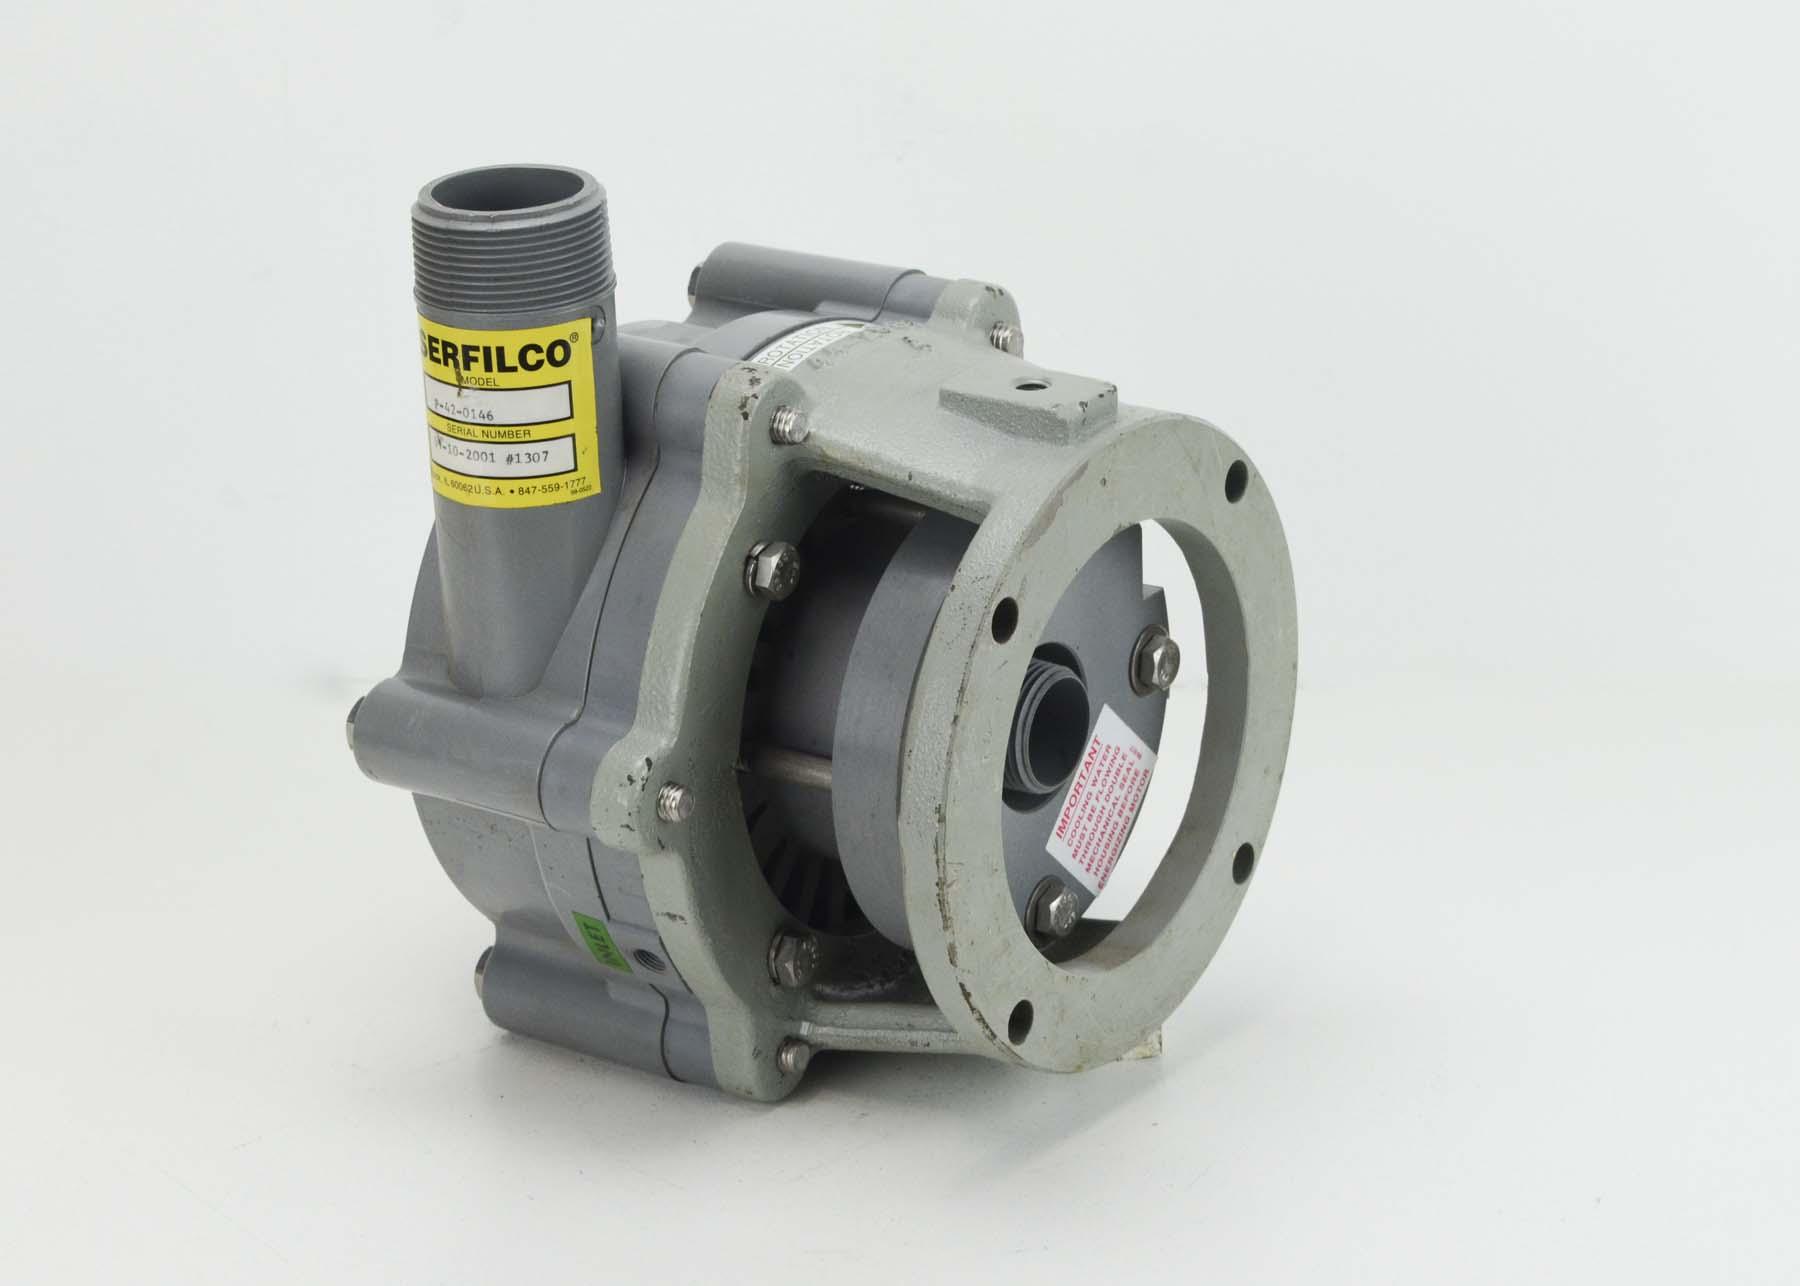 Serfilco P-42-0146 Pump